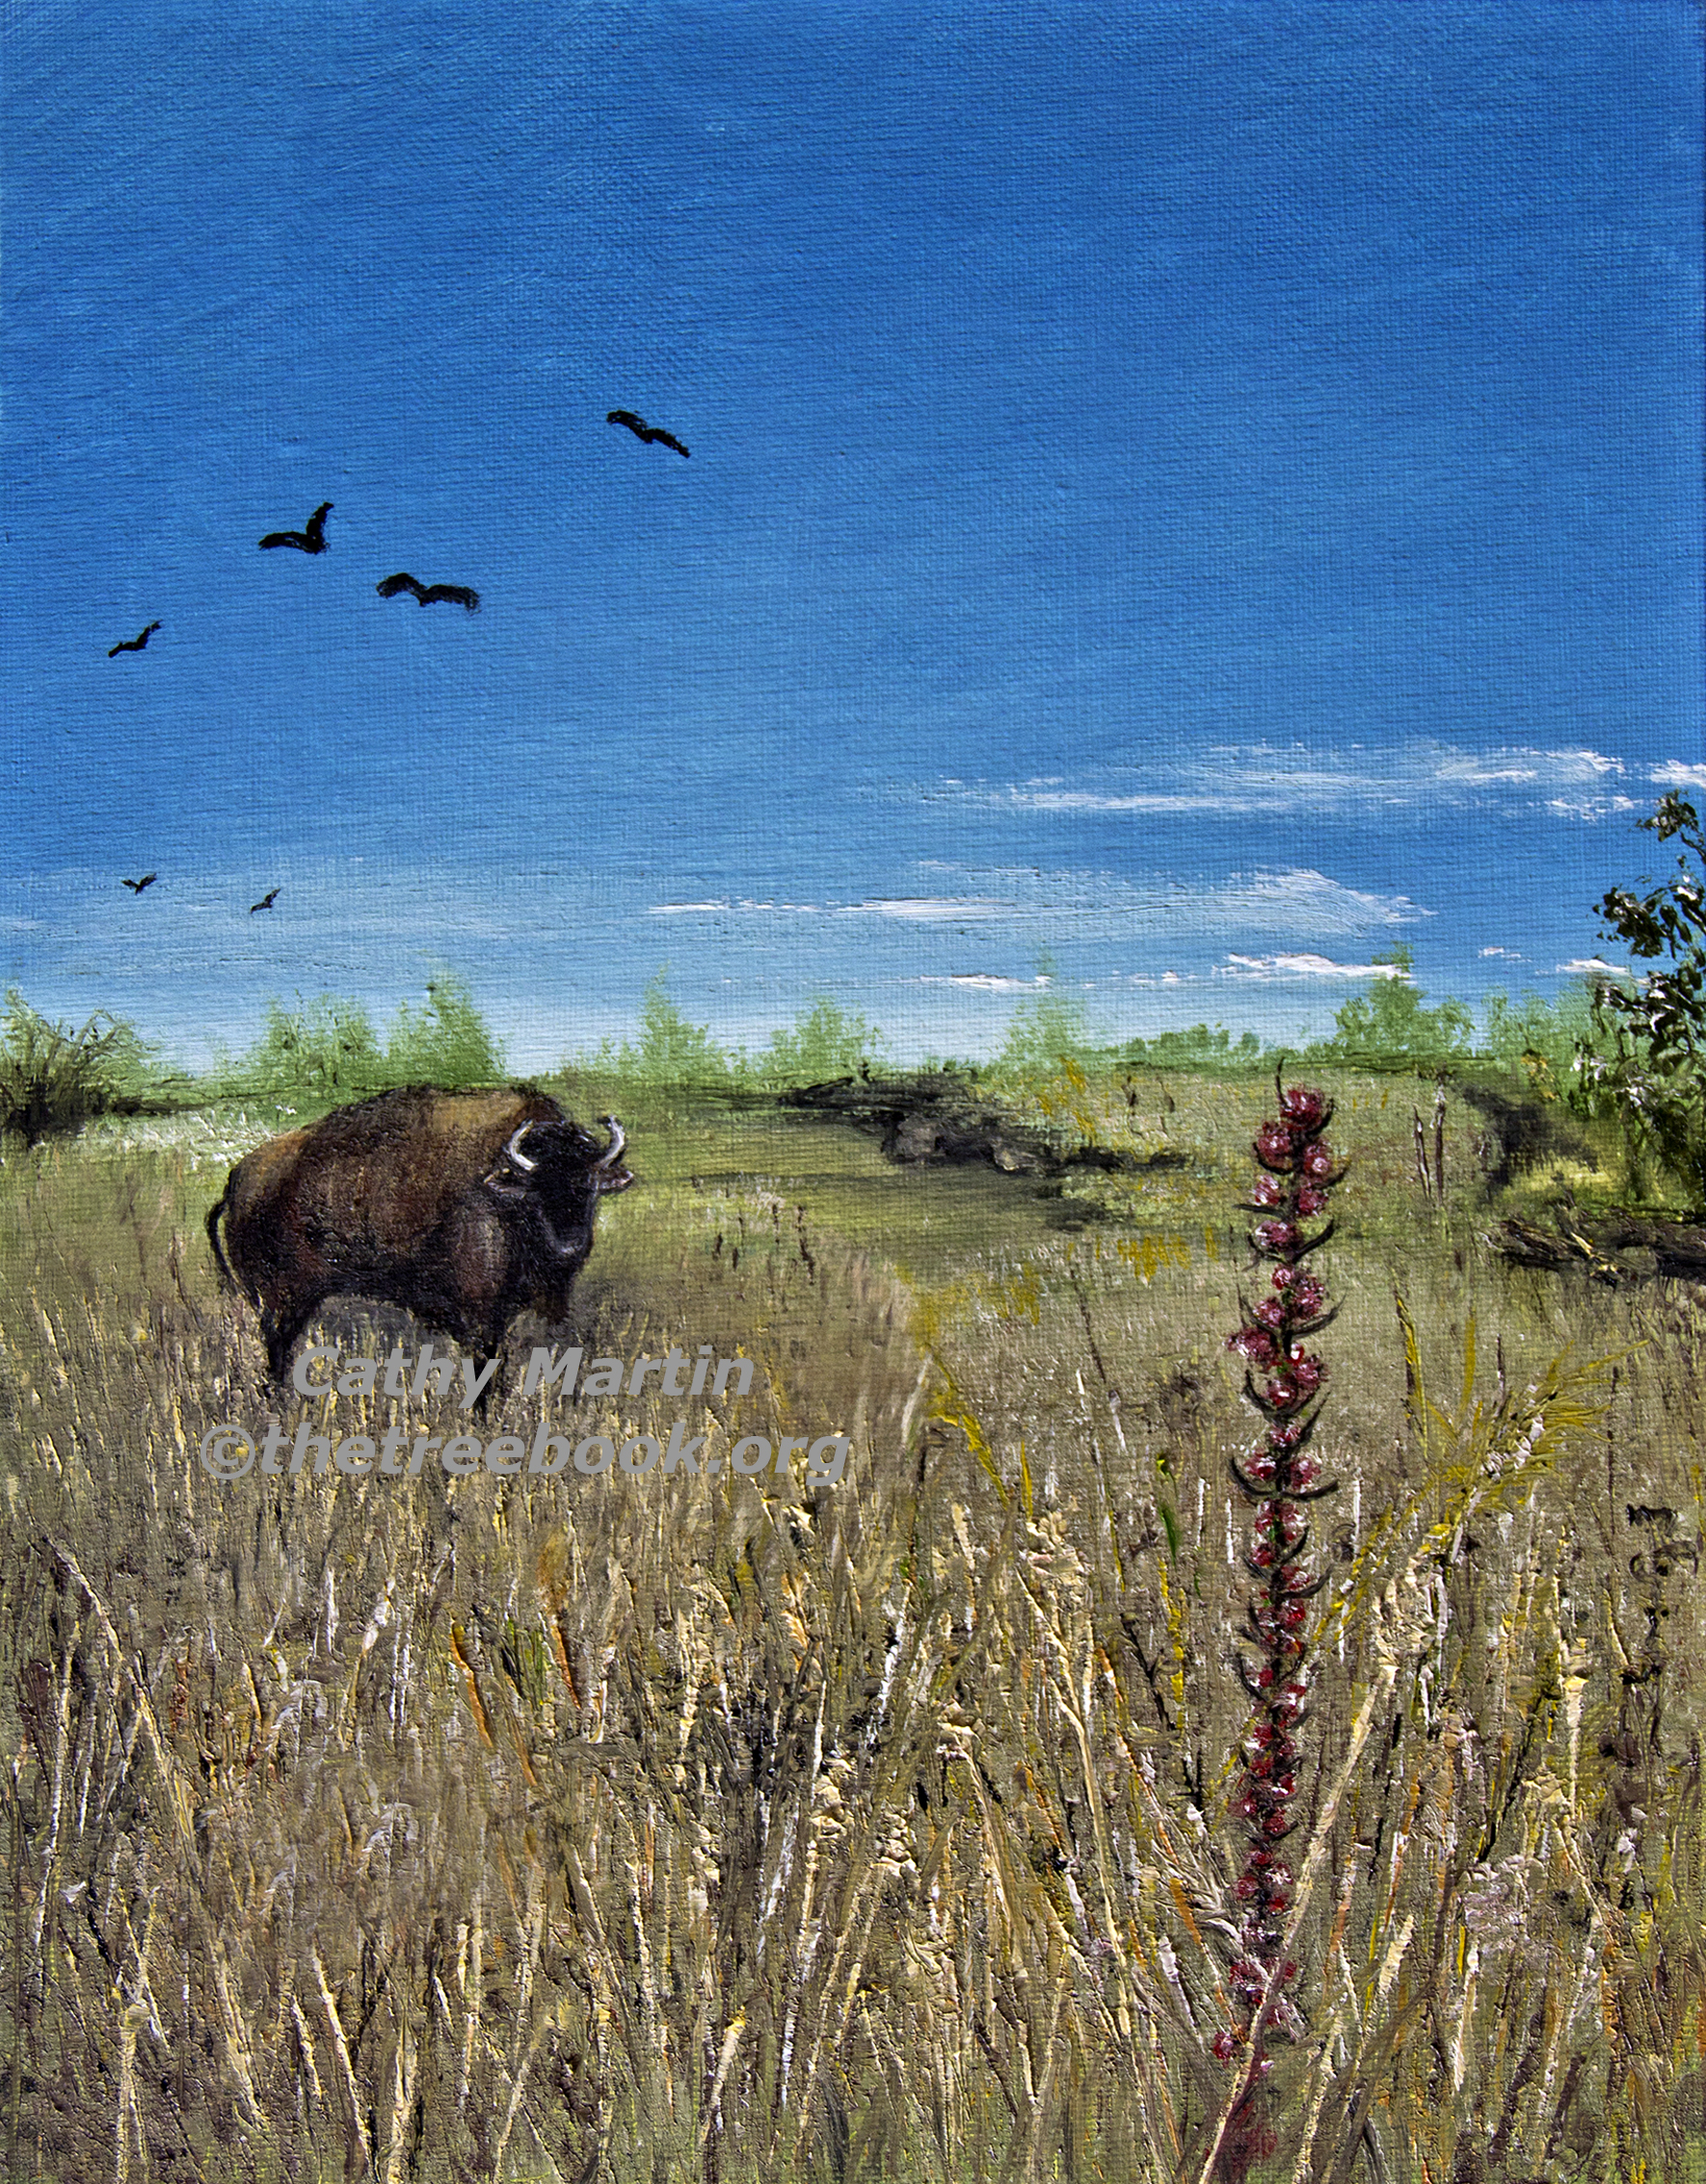 Buffalo by artist Cathy Martin